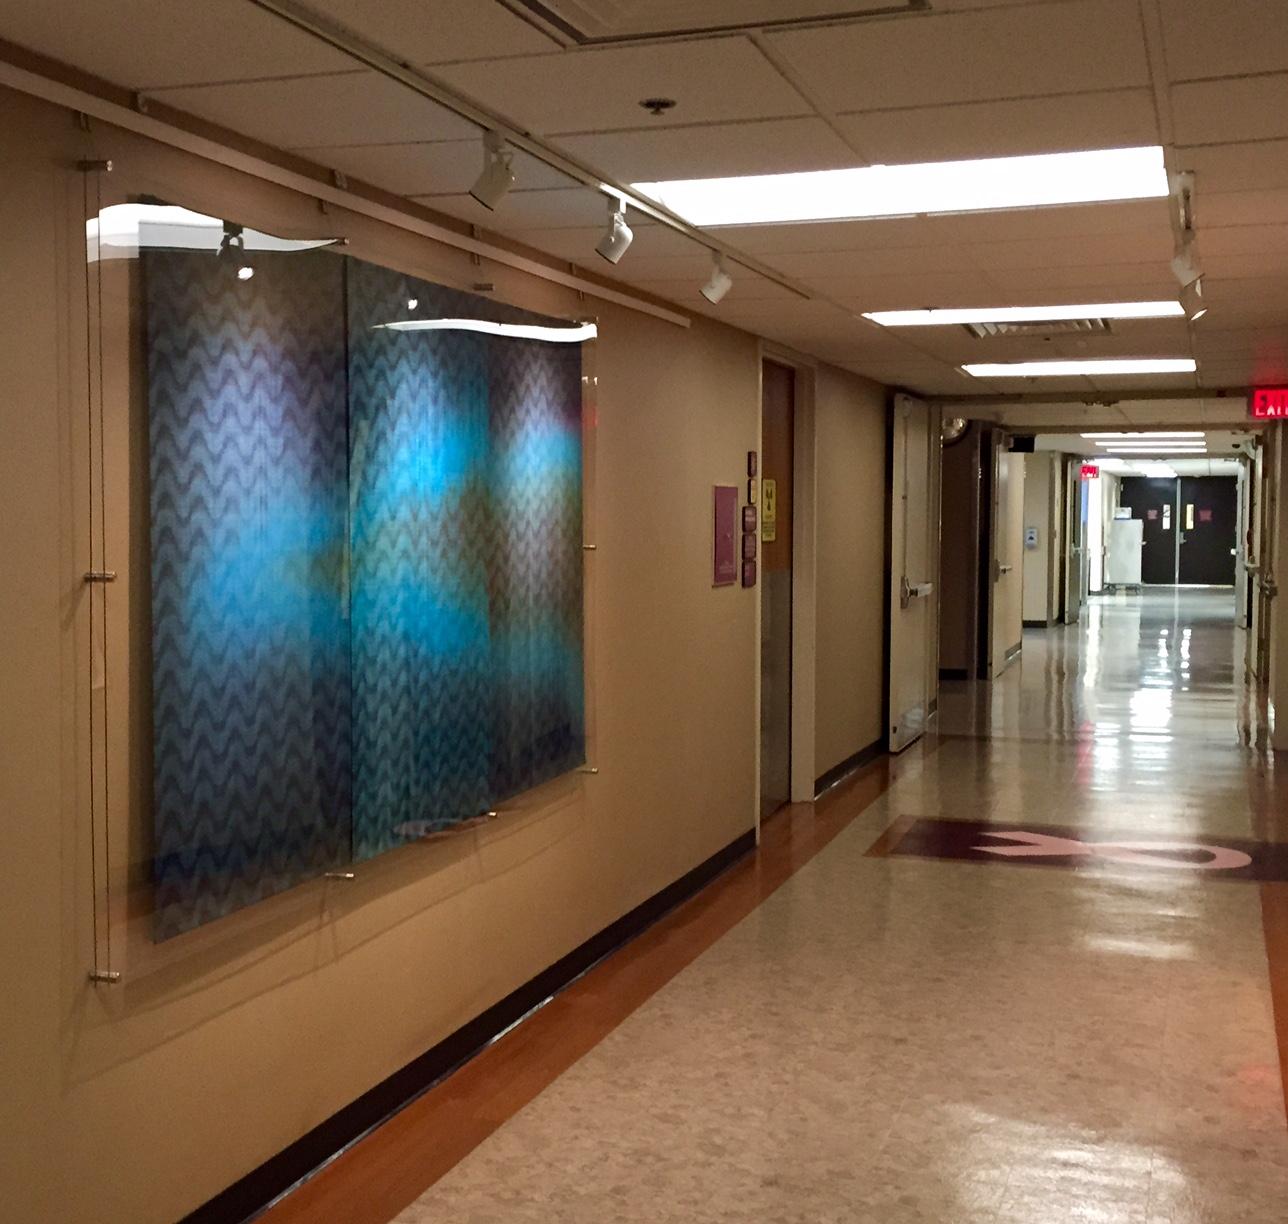 Truman Medical Center  Kansas City, MO  Photo credit: Eg Schempf